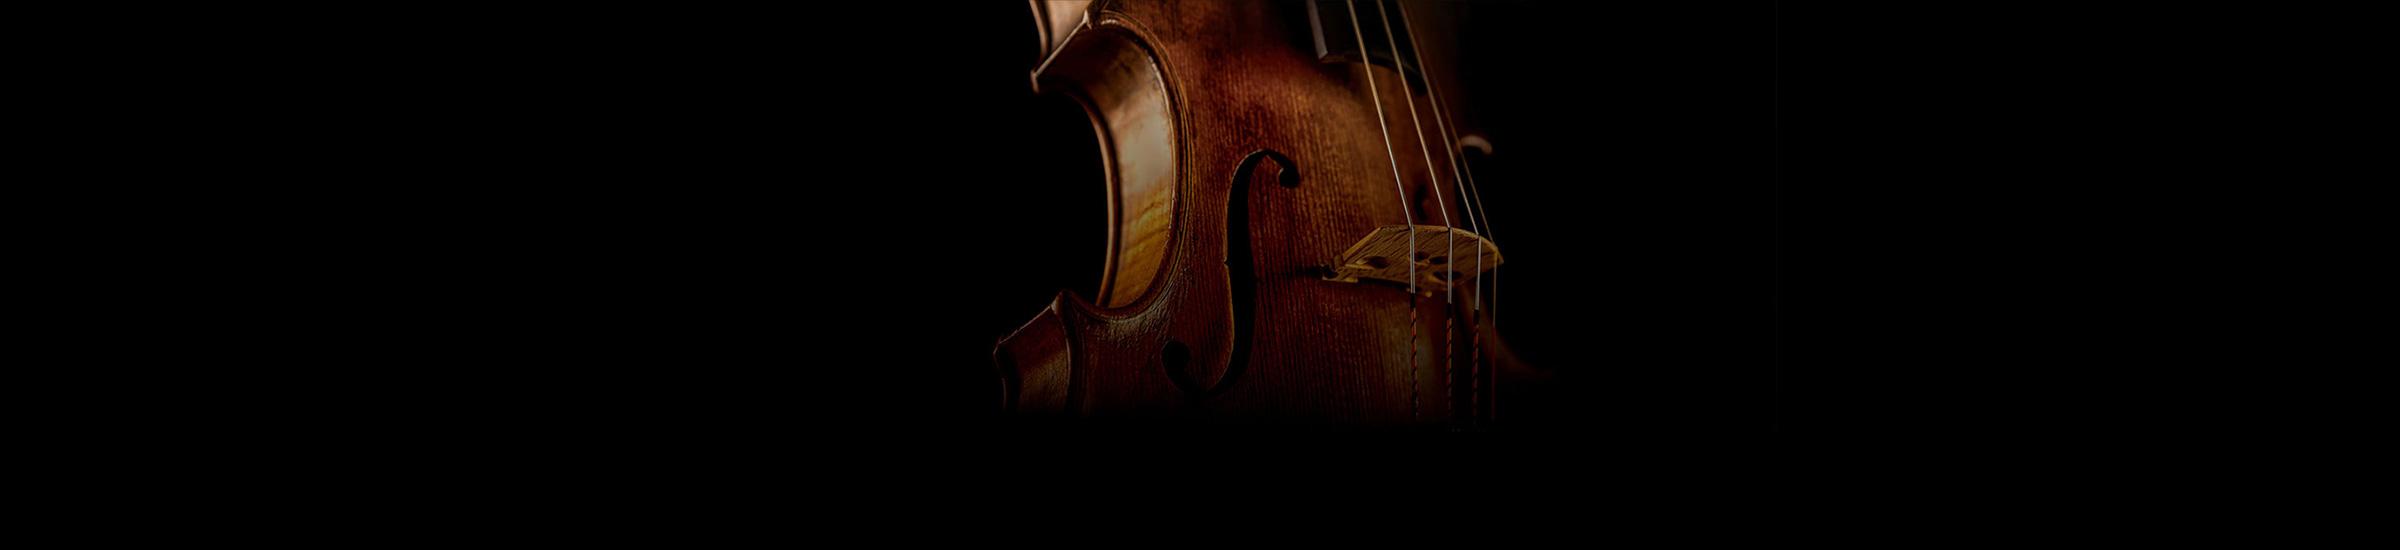 chamber music houston symphony